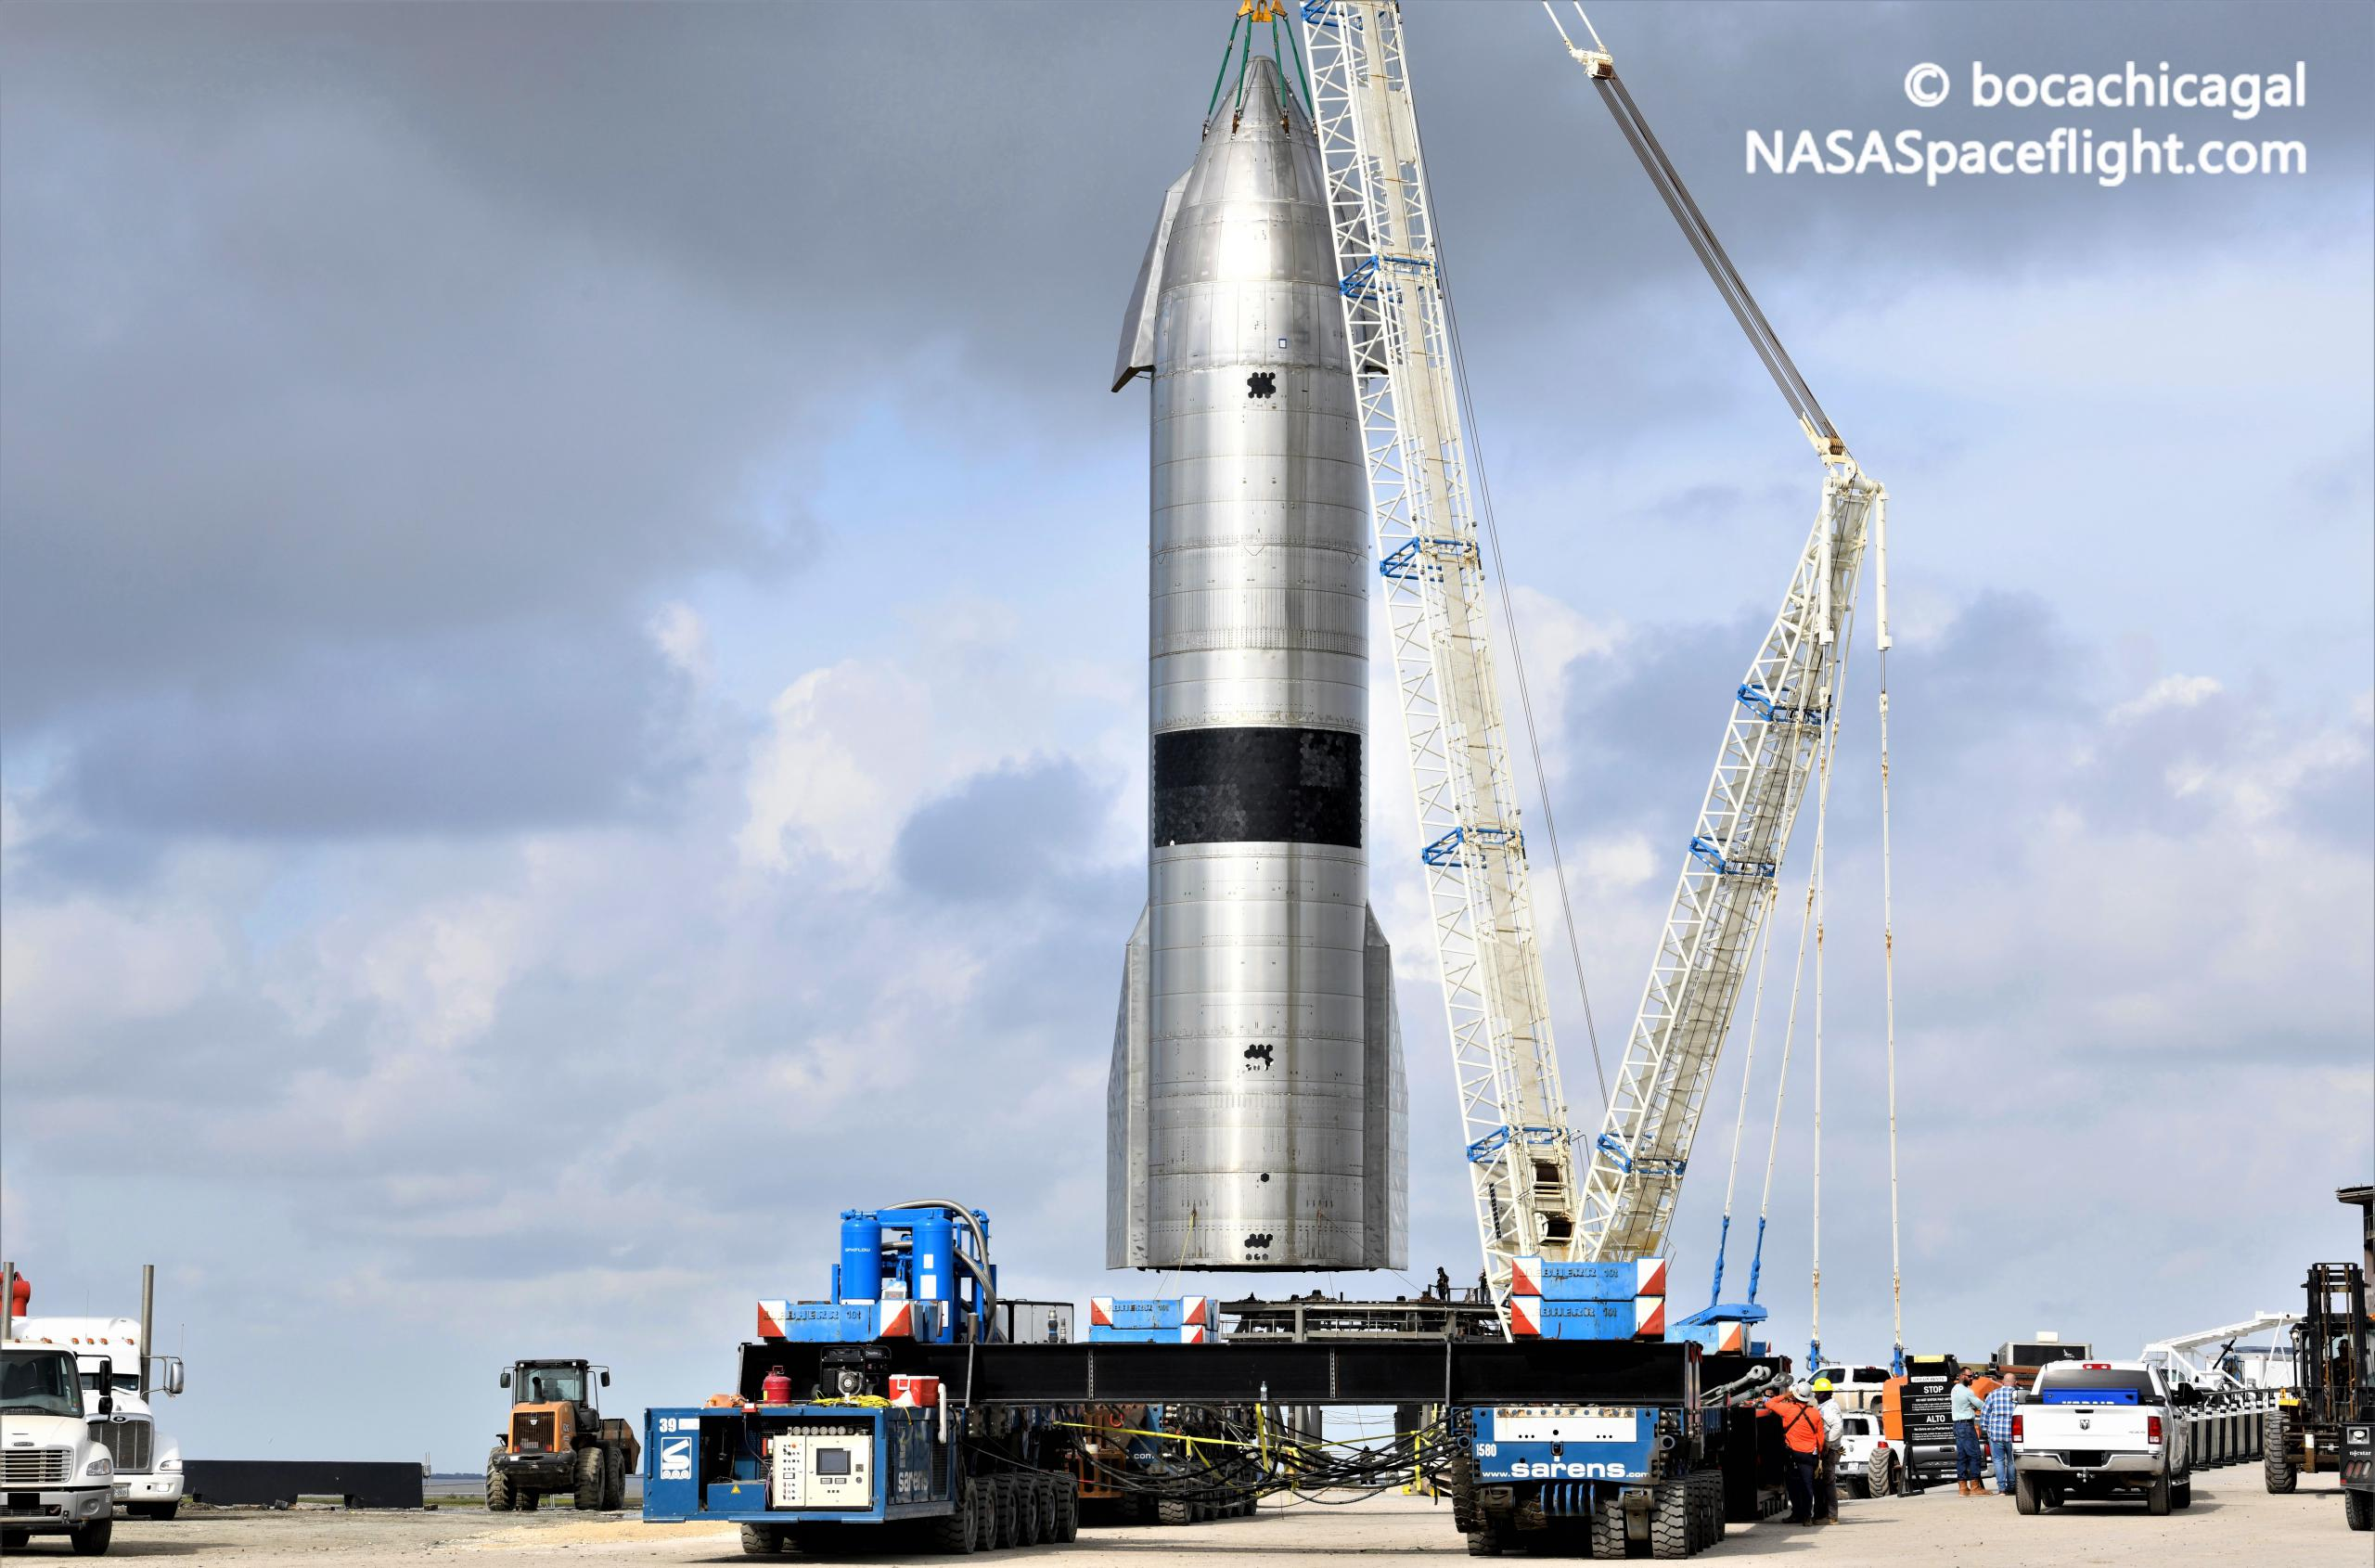 Starship Boca Chica 051421 (NASASpaceflight – bocachicagal) SN15 5 (c)